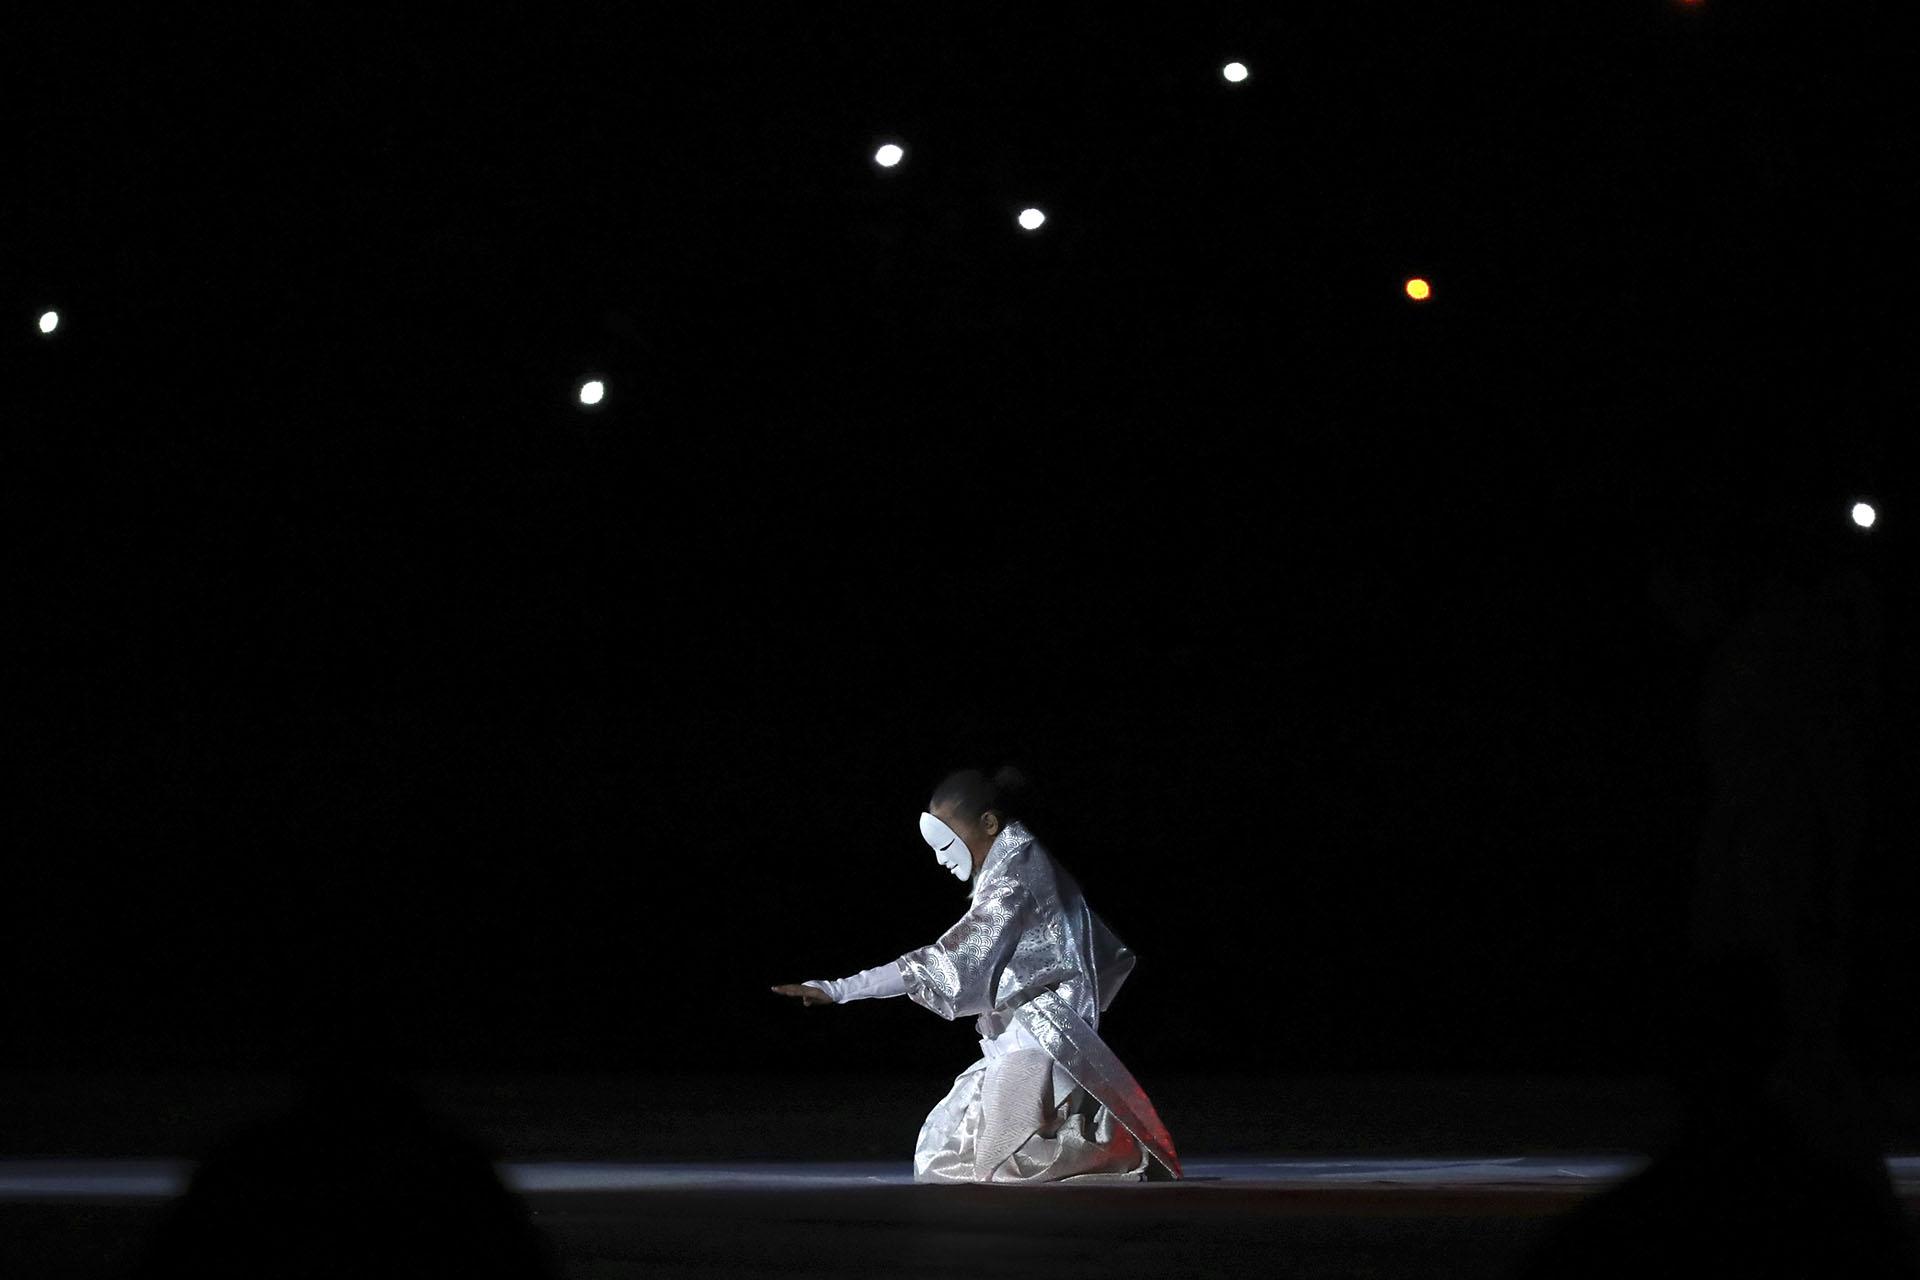 La ceremonia de apertura fue corta, pero dinámica y mostró la cultura de Japón (AP Photo/Eugene Hoshiko)